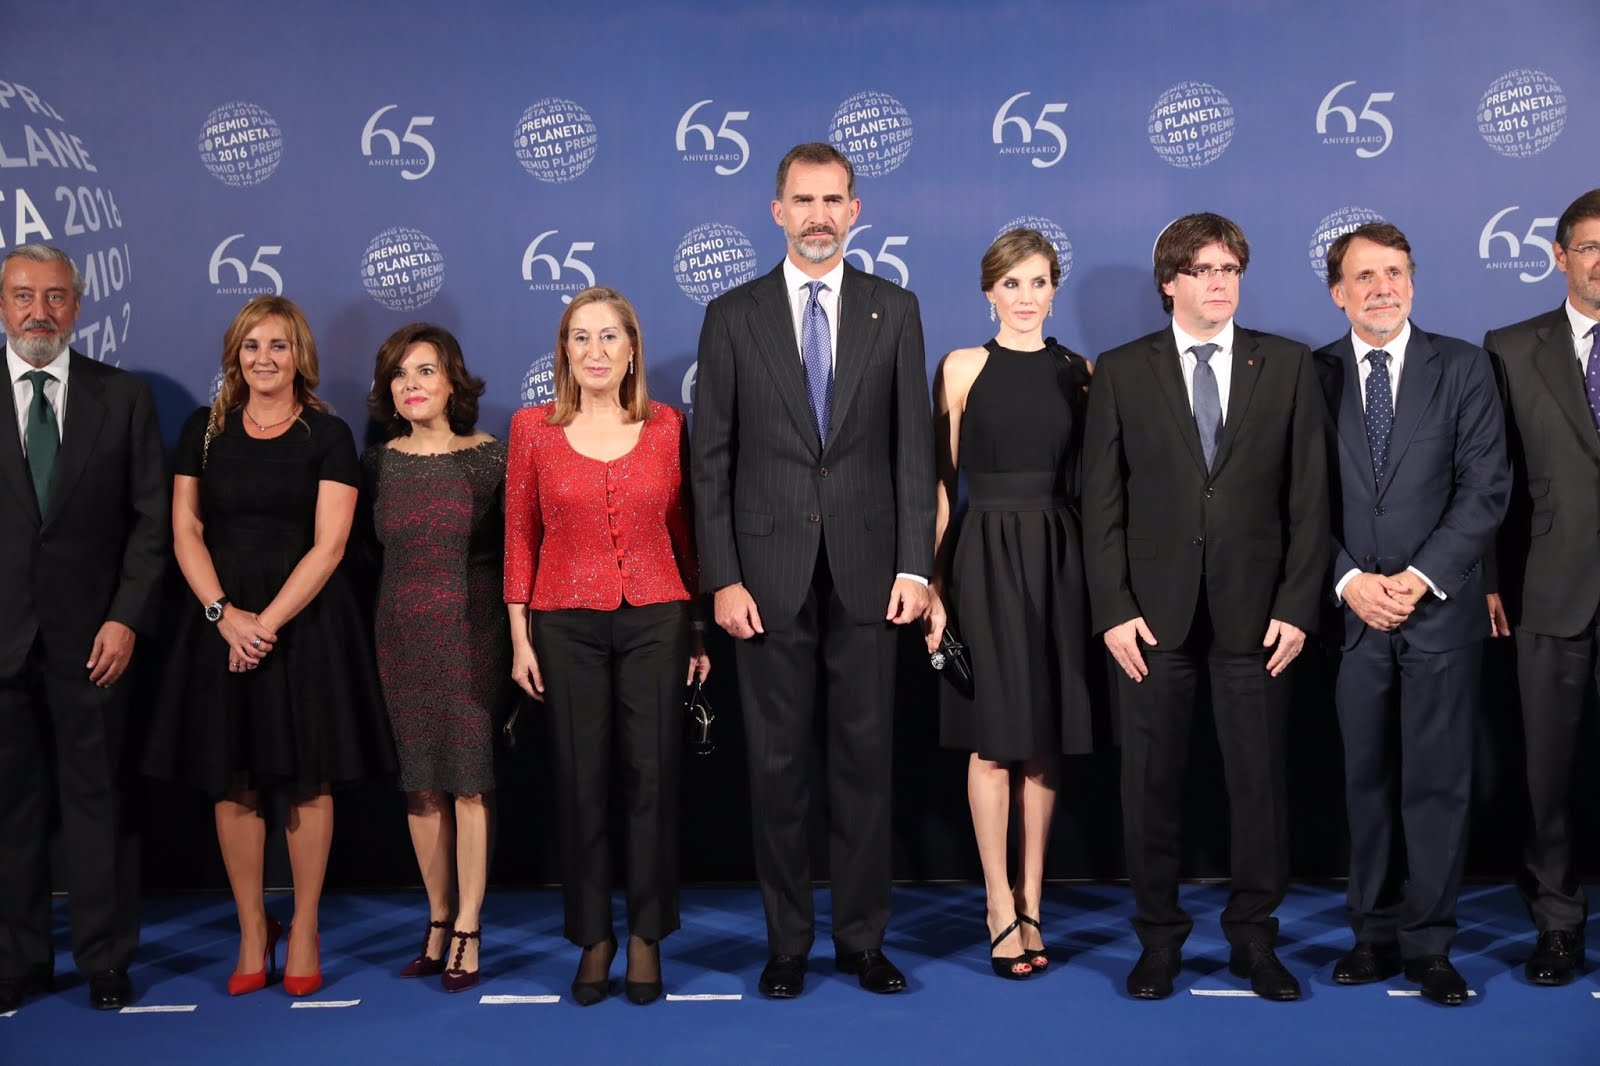 ¿Cuánto mide Carles Puigdemont? - Estatura - Real height Cu1fzvyWYAAff0H.jpg-large